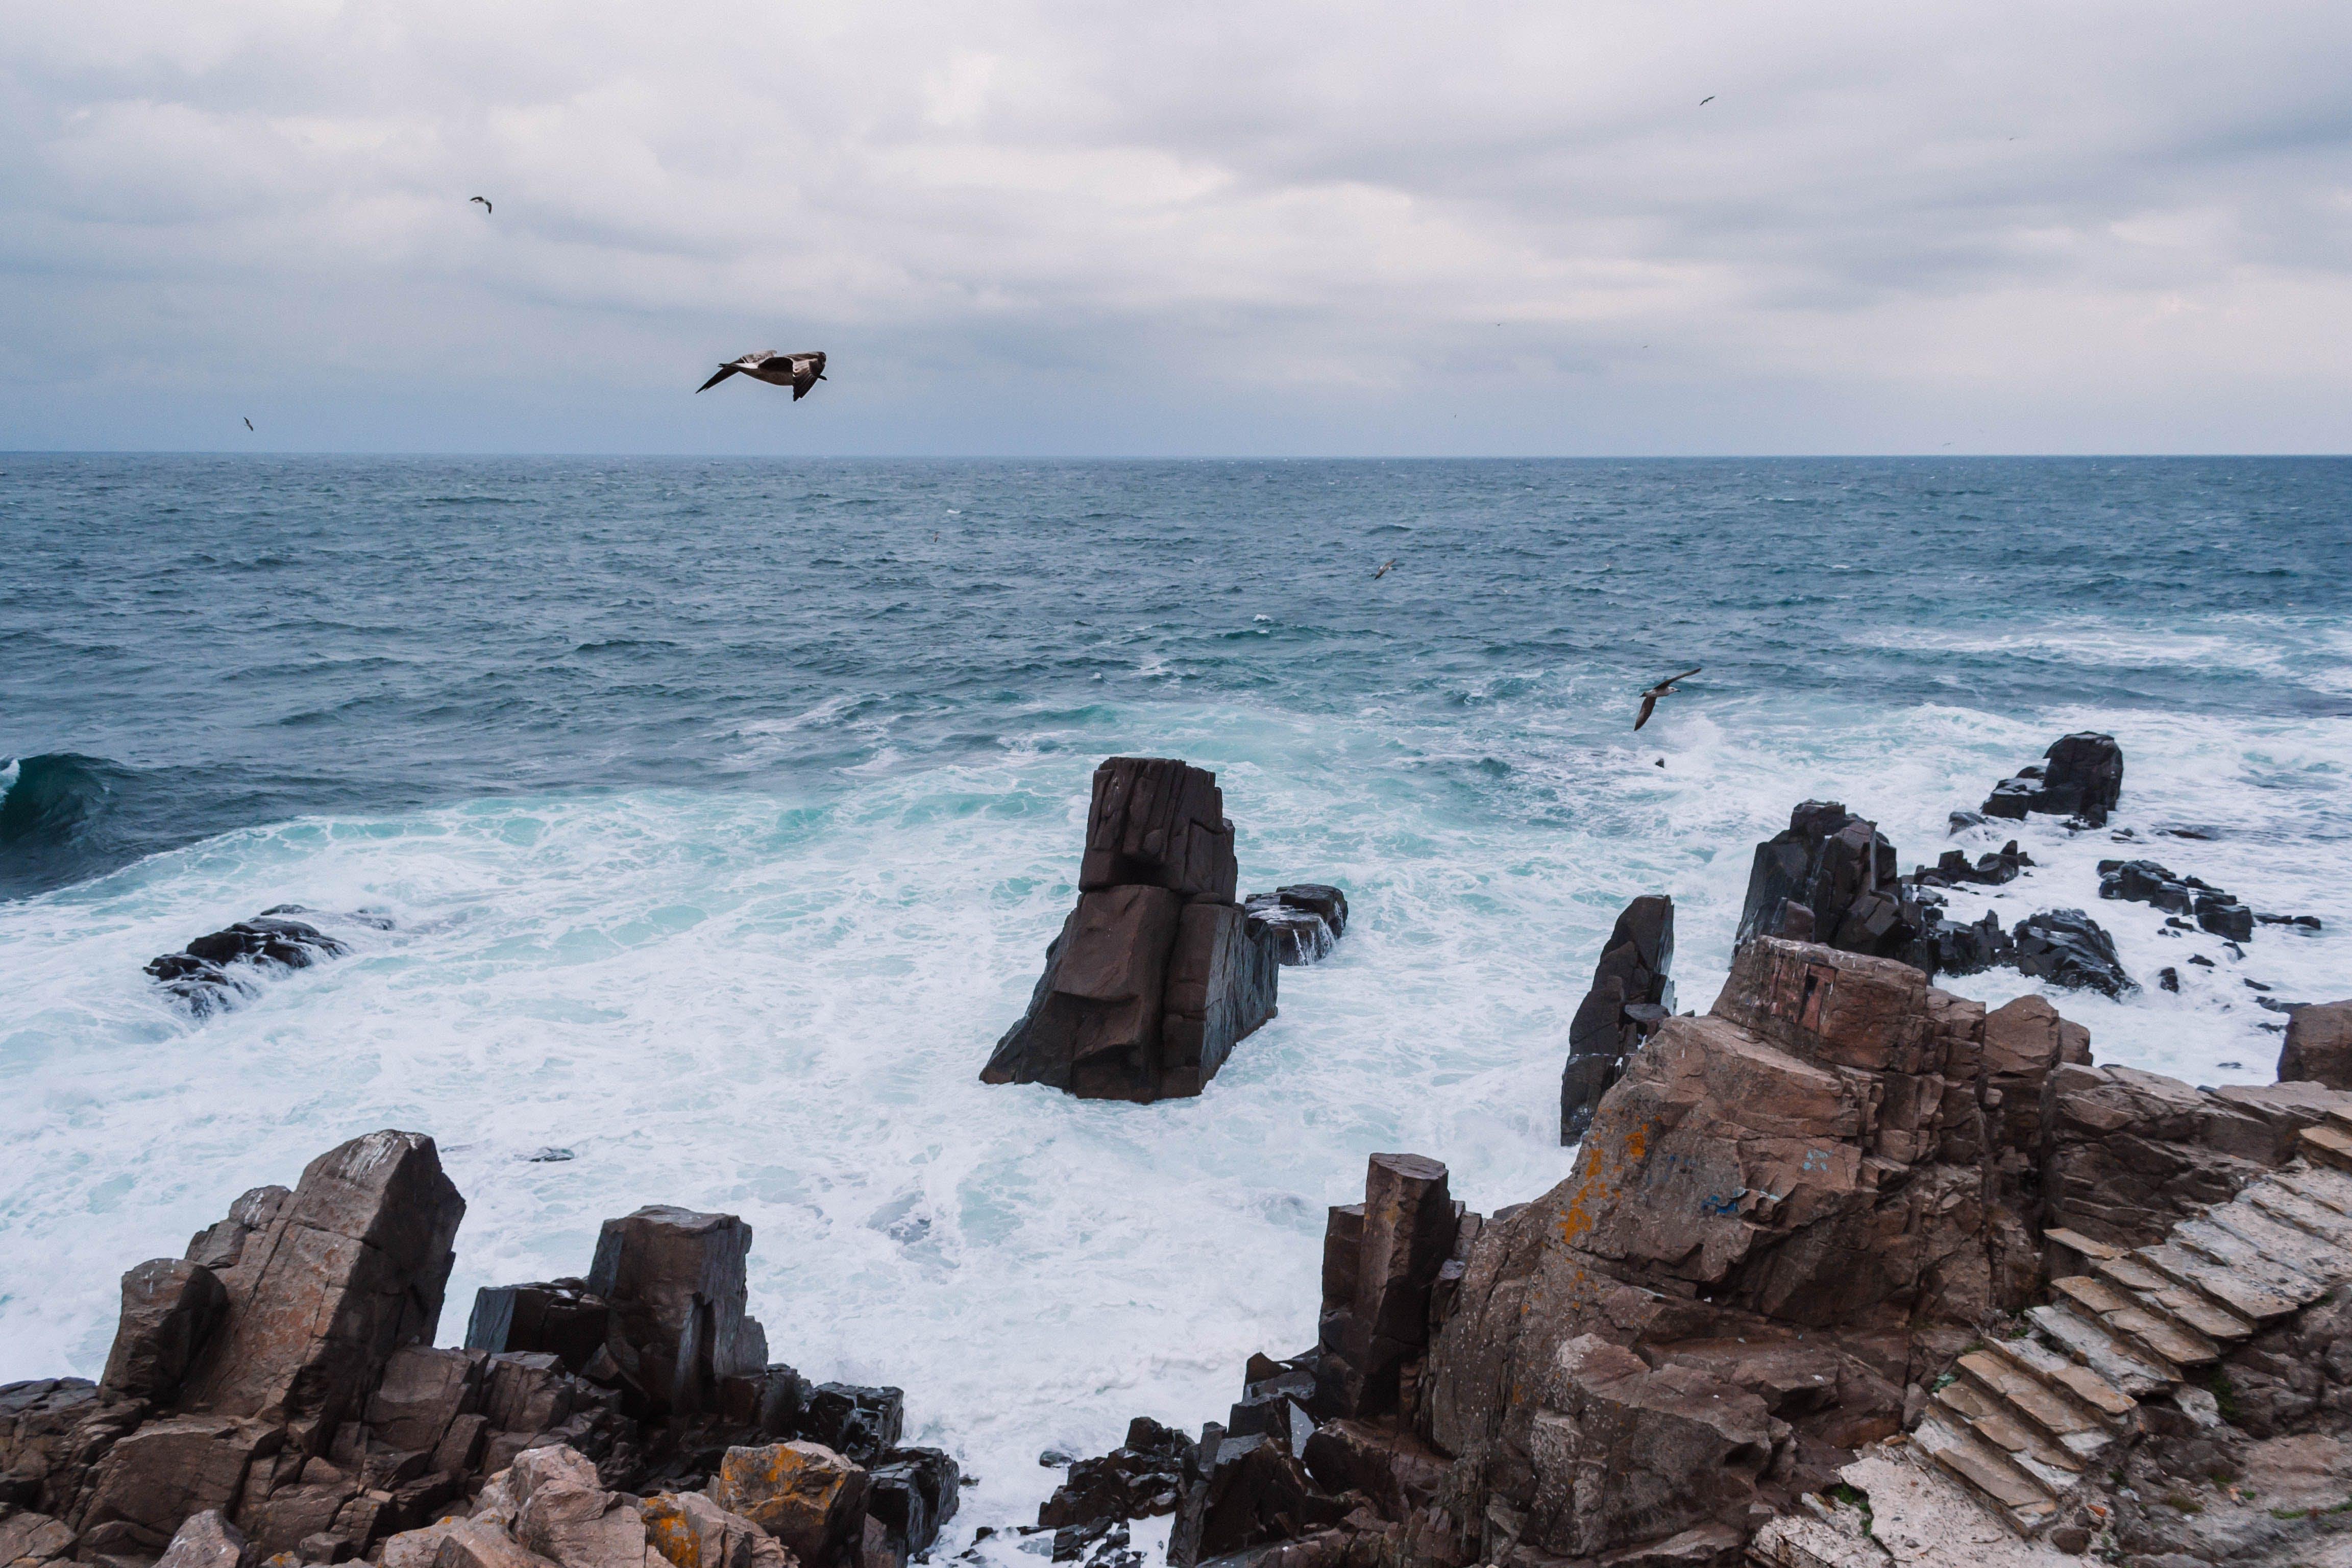 Wavy Sea Crashing Through Rock Formations